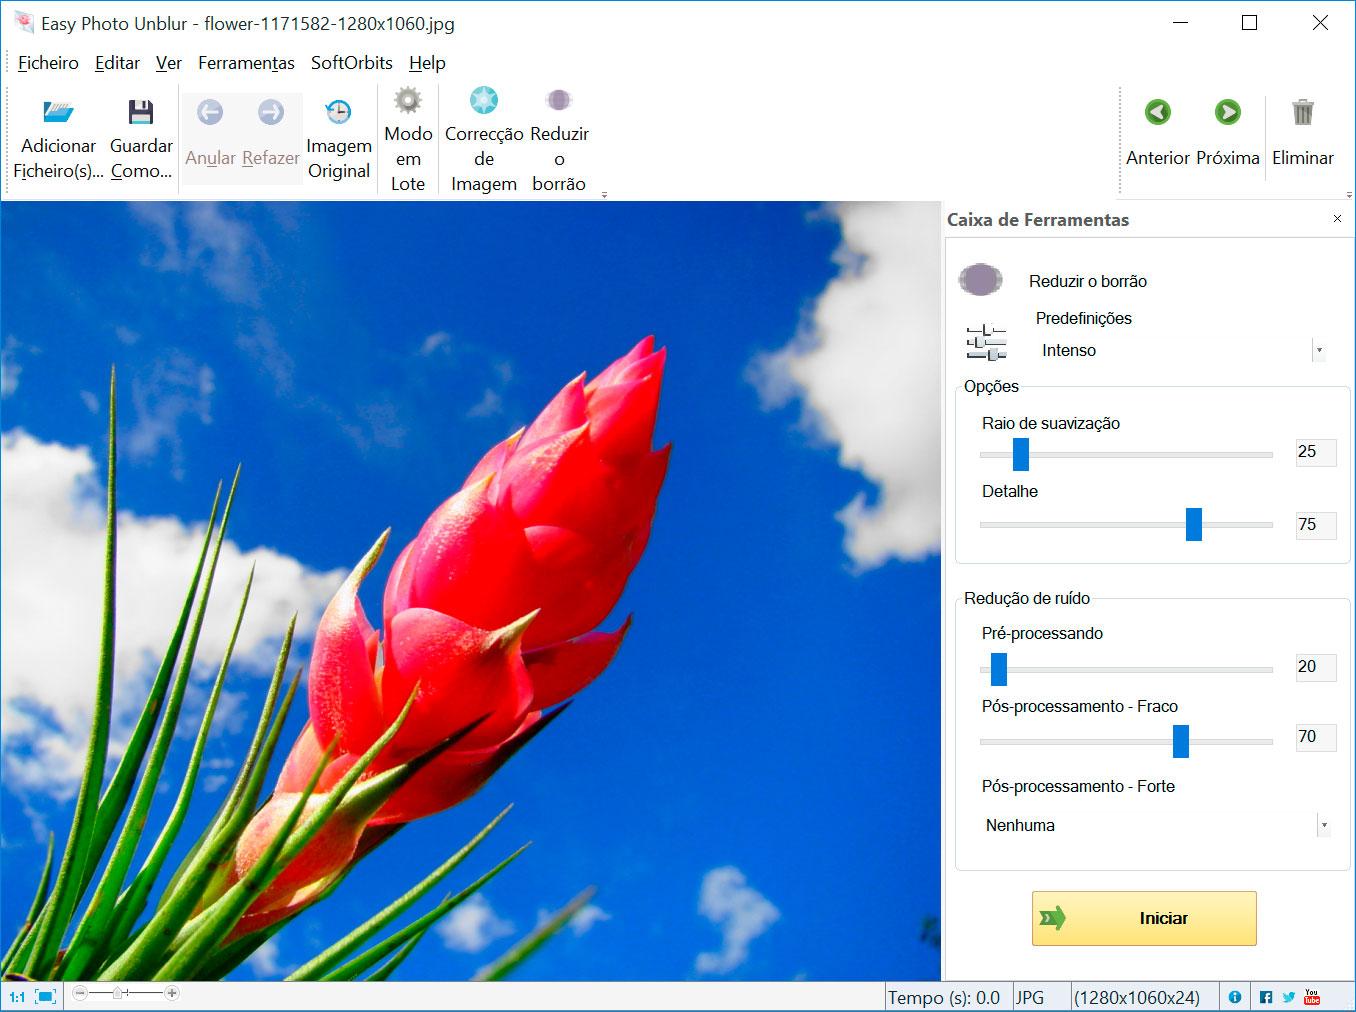 Easy Photo Unblur Capturas de tela